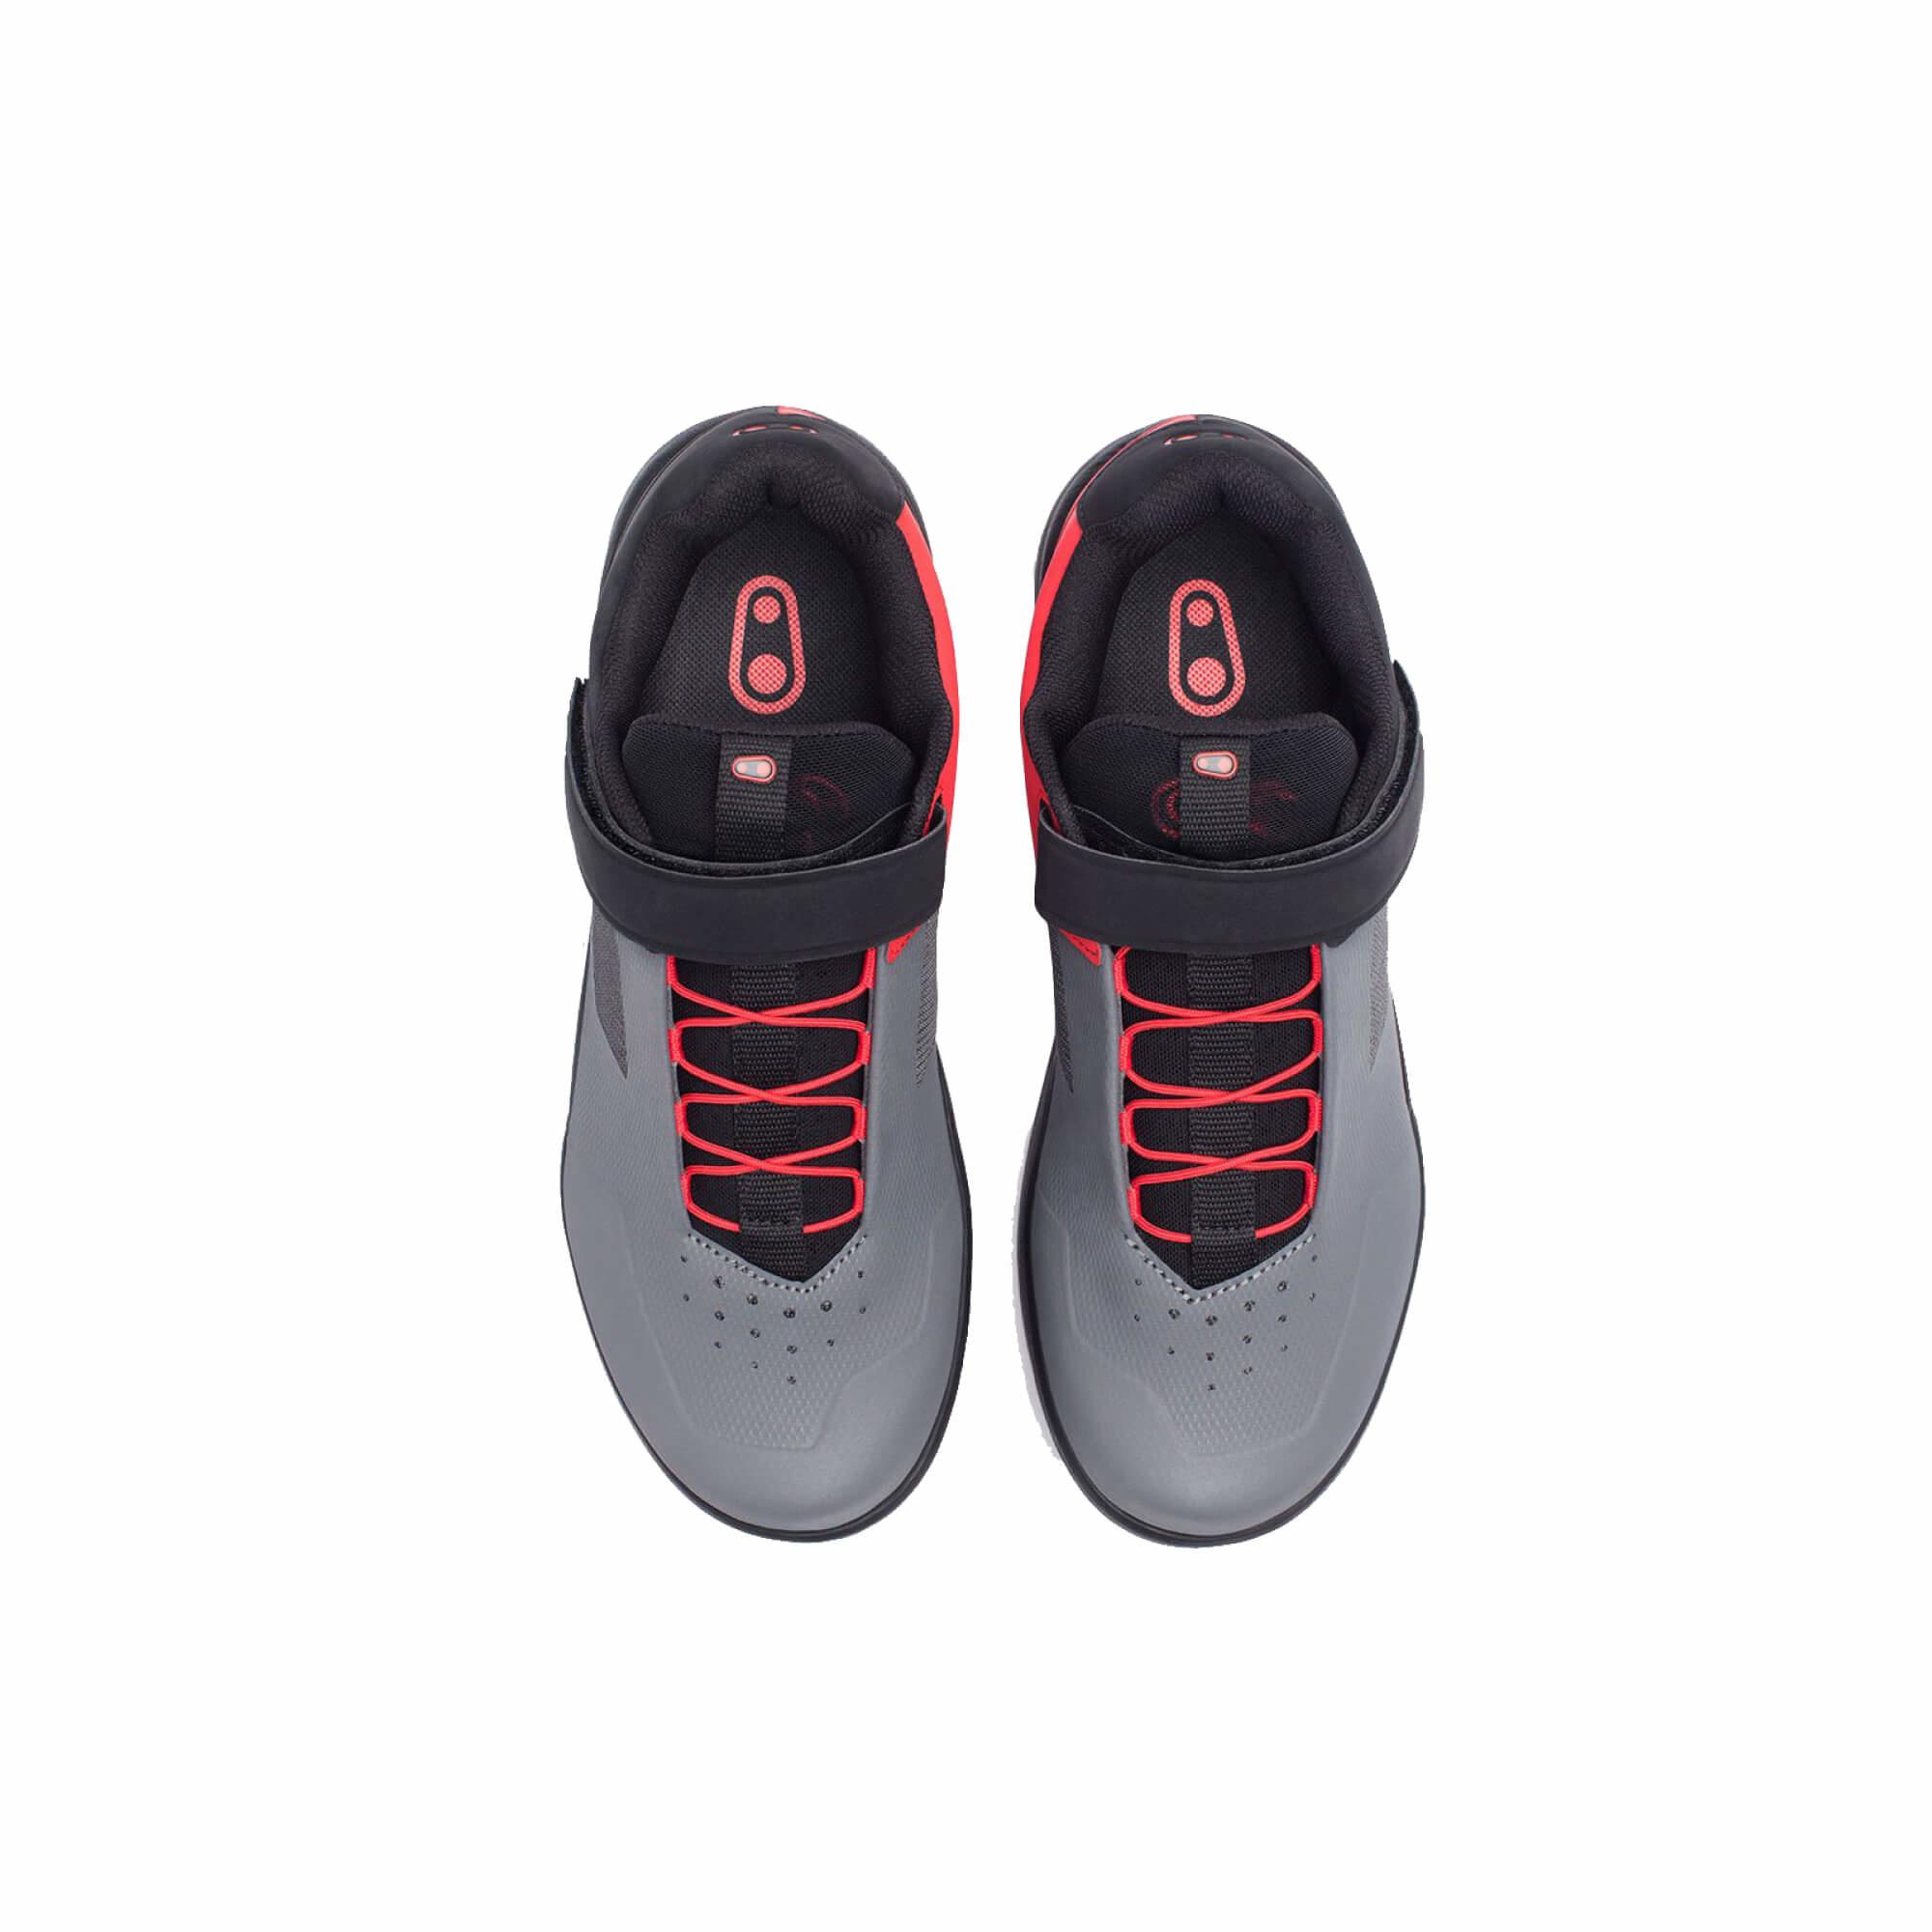 Shoes Stamp Speedlace Flat-5